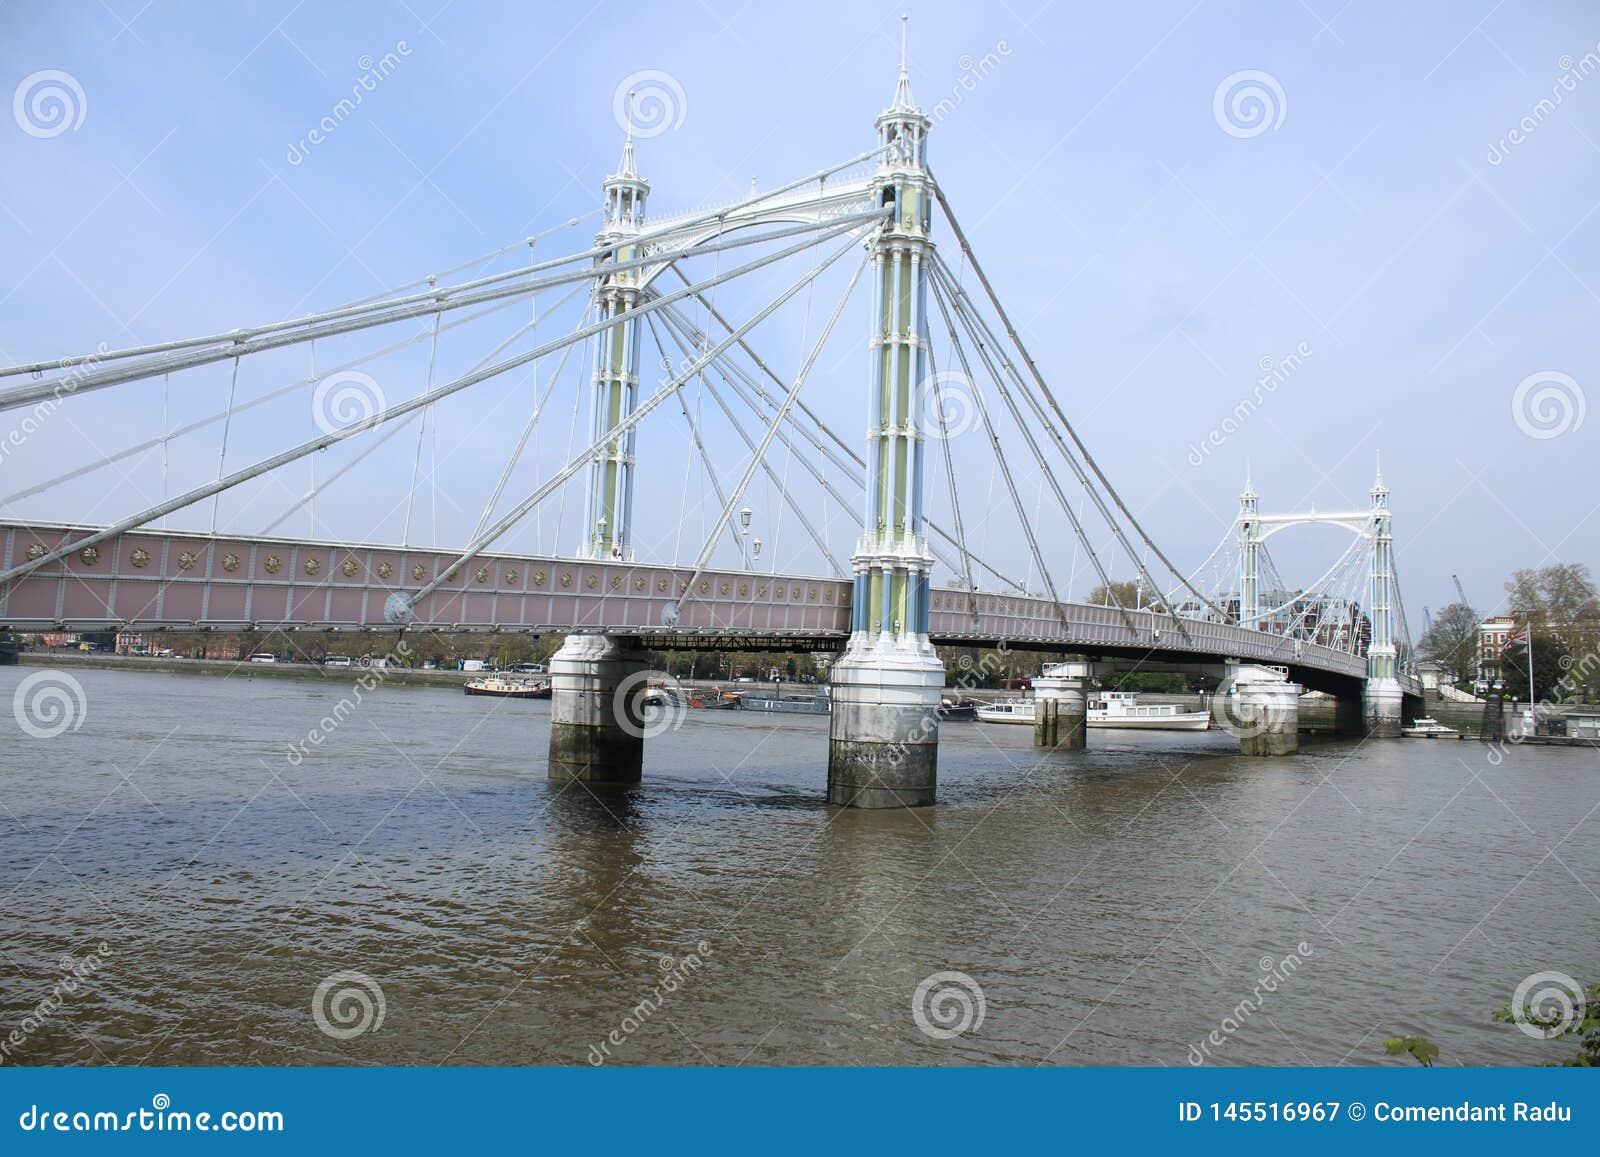 Мост около парка Battersea В типичном дне